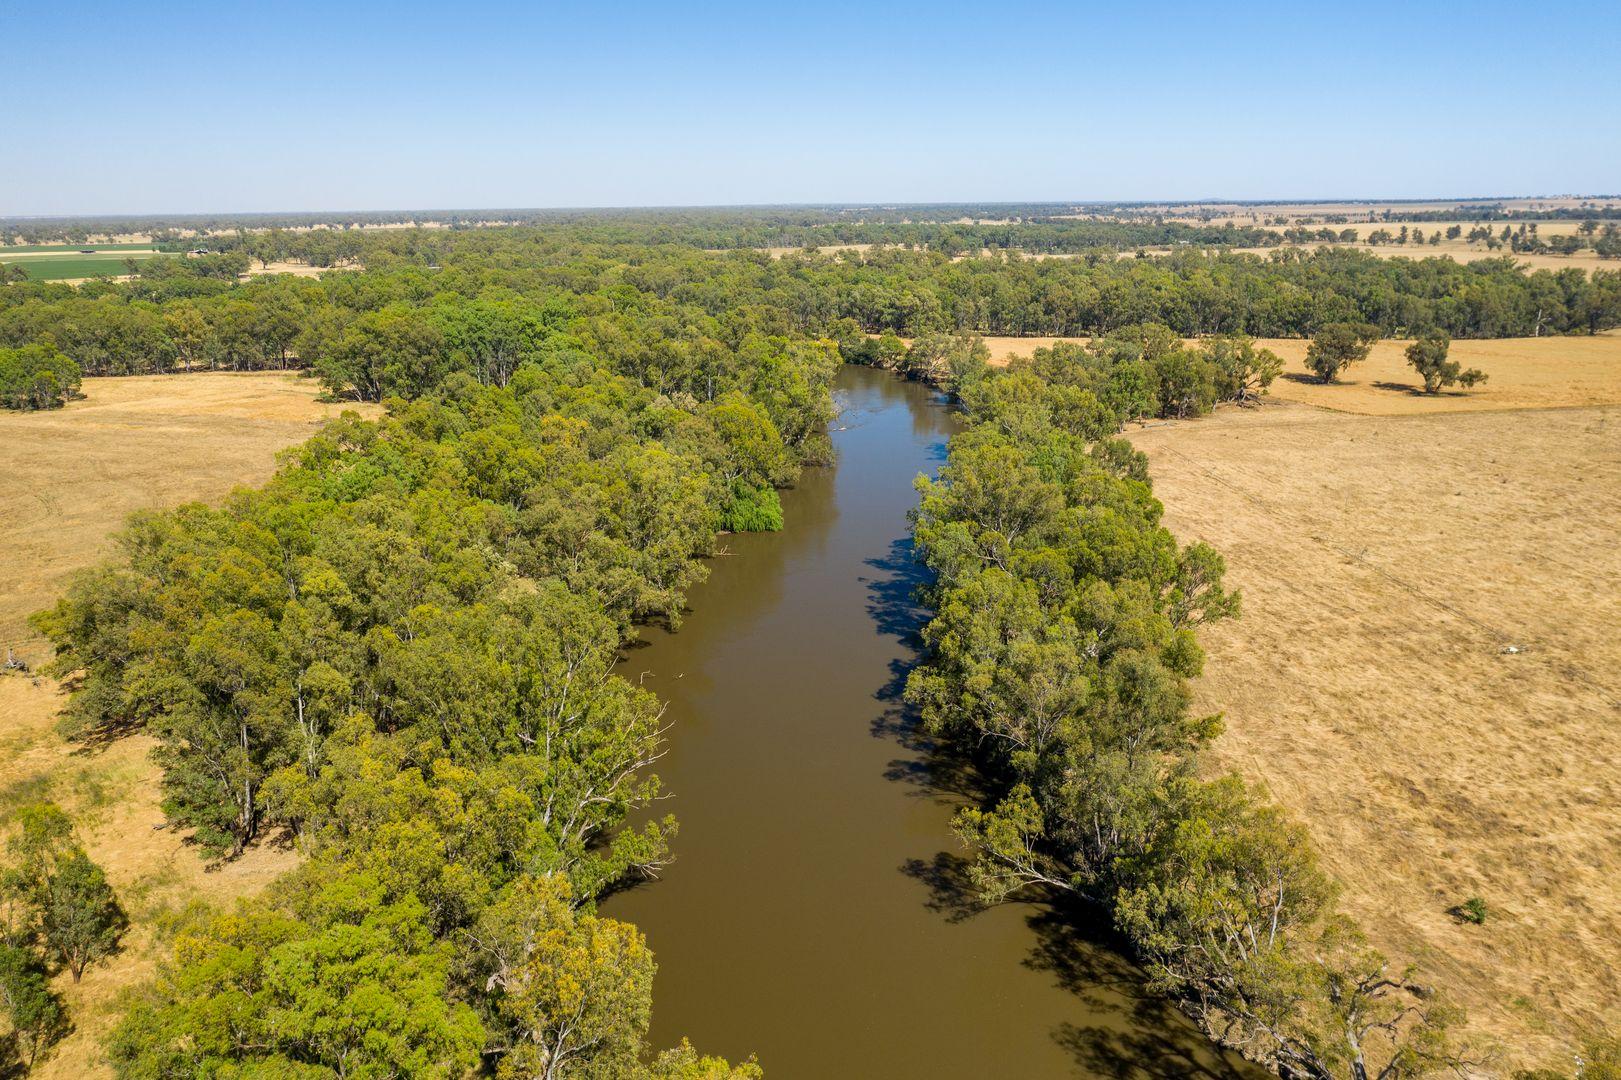 2239 OLD NARRANDERA ROAD, CURRAWARNA VIA, Wagga Wagga NSW 2650, Image 2